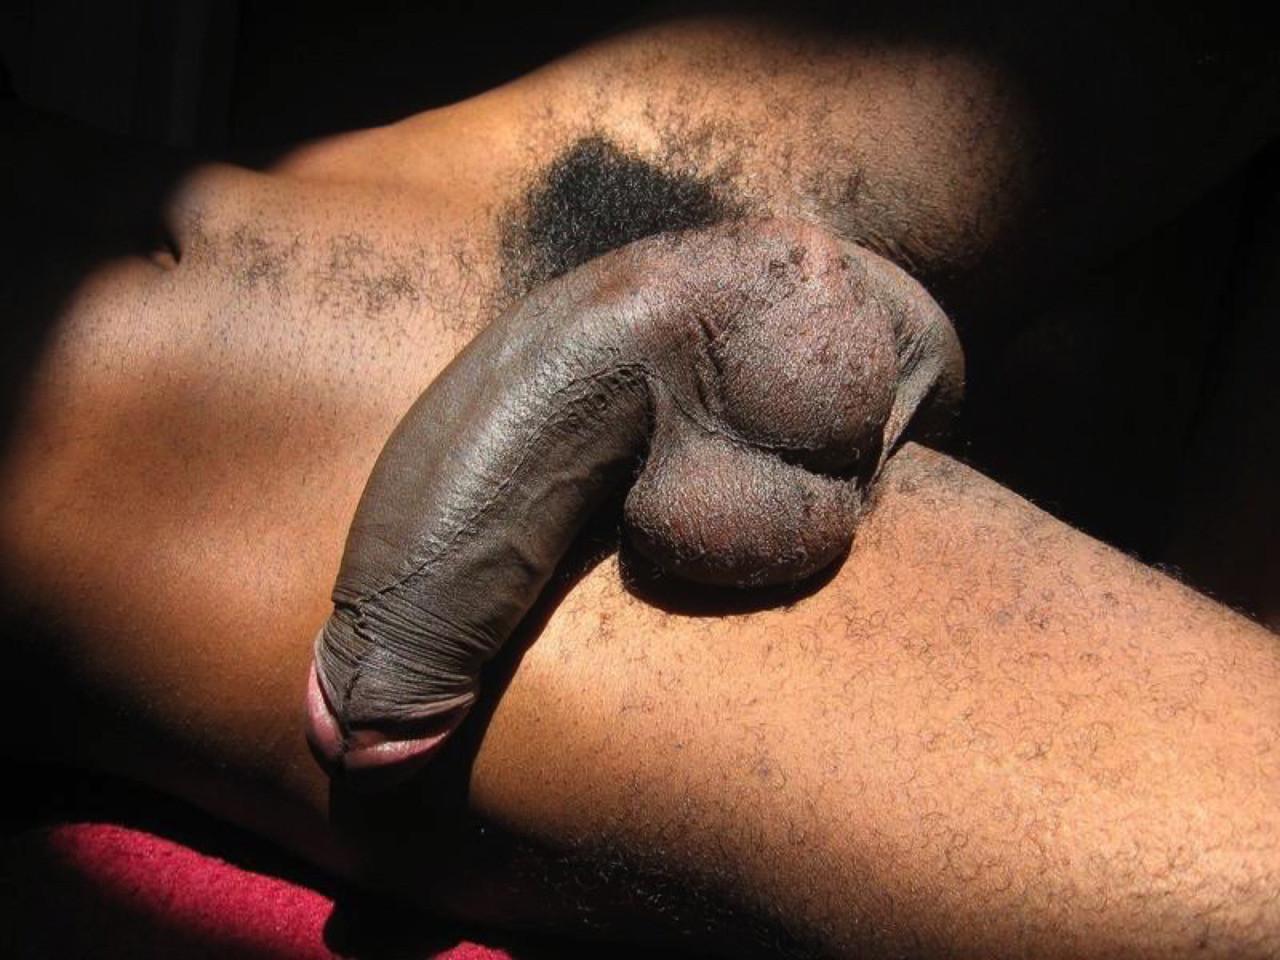 bang-barcelos-cock-pictures-porn